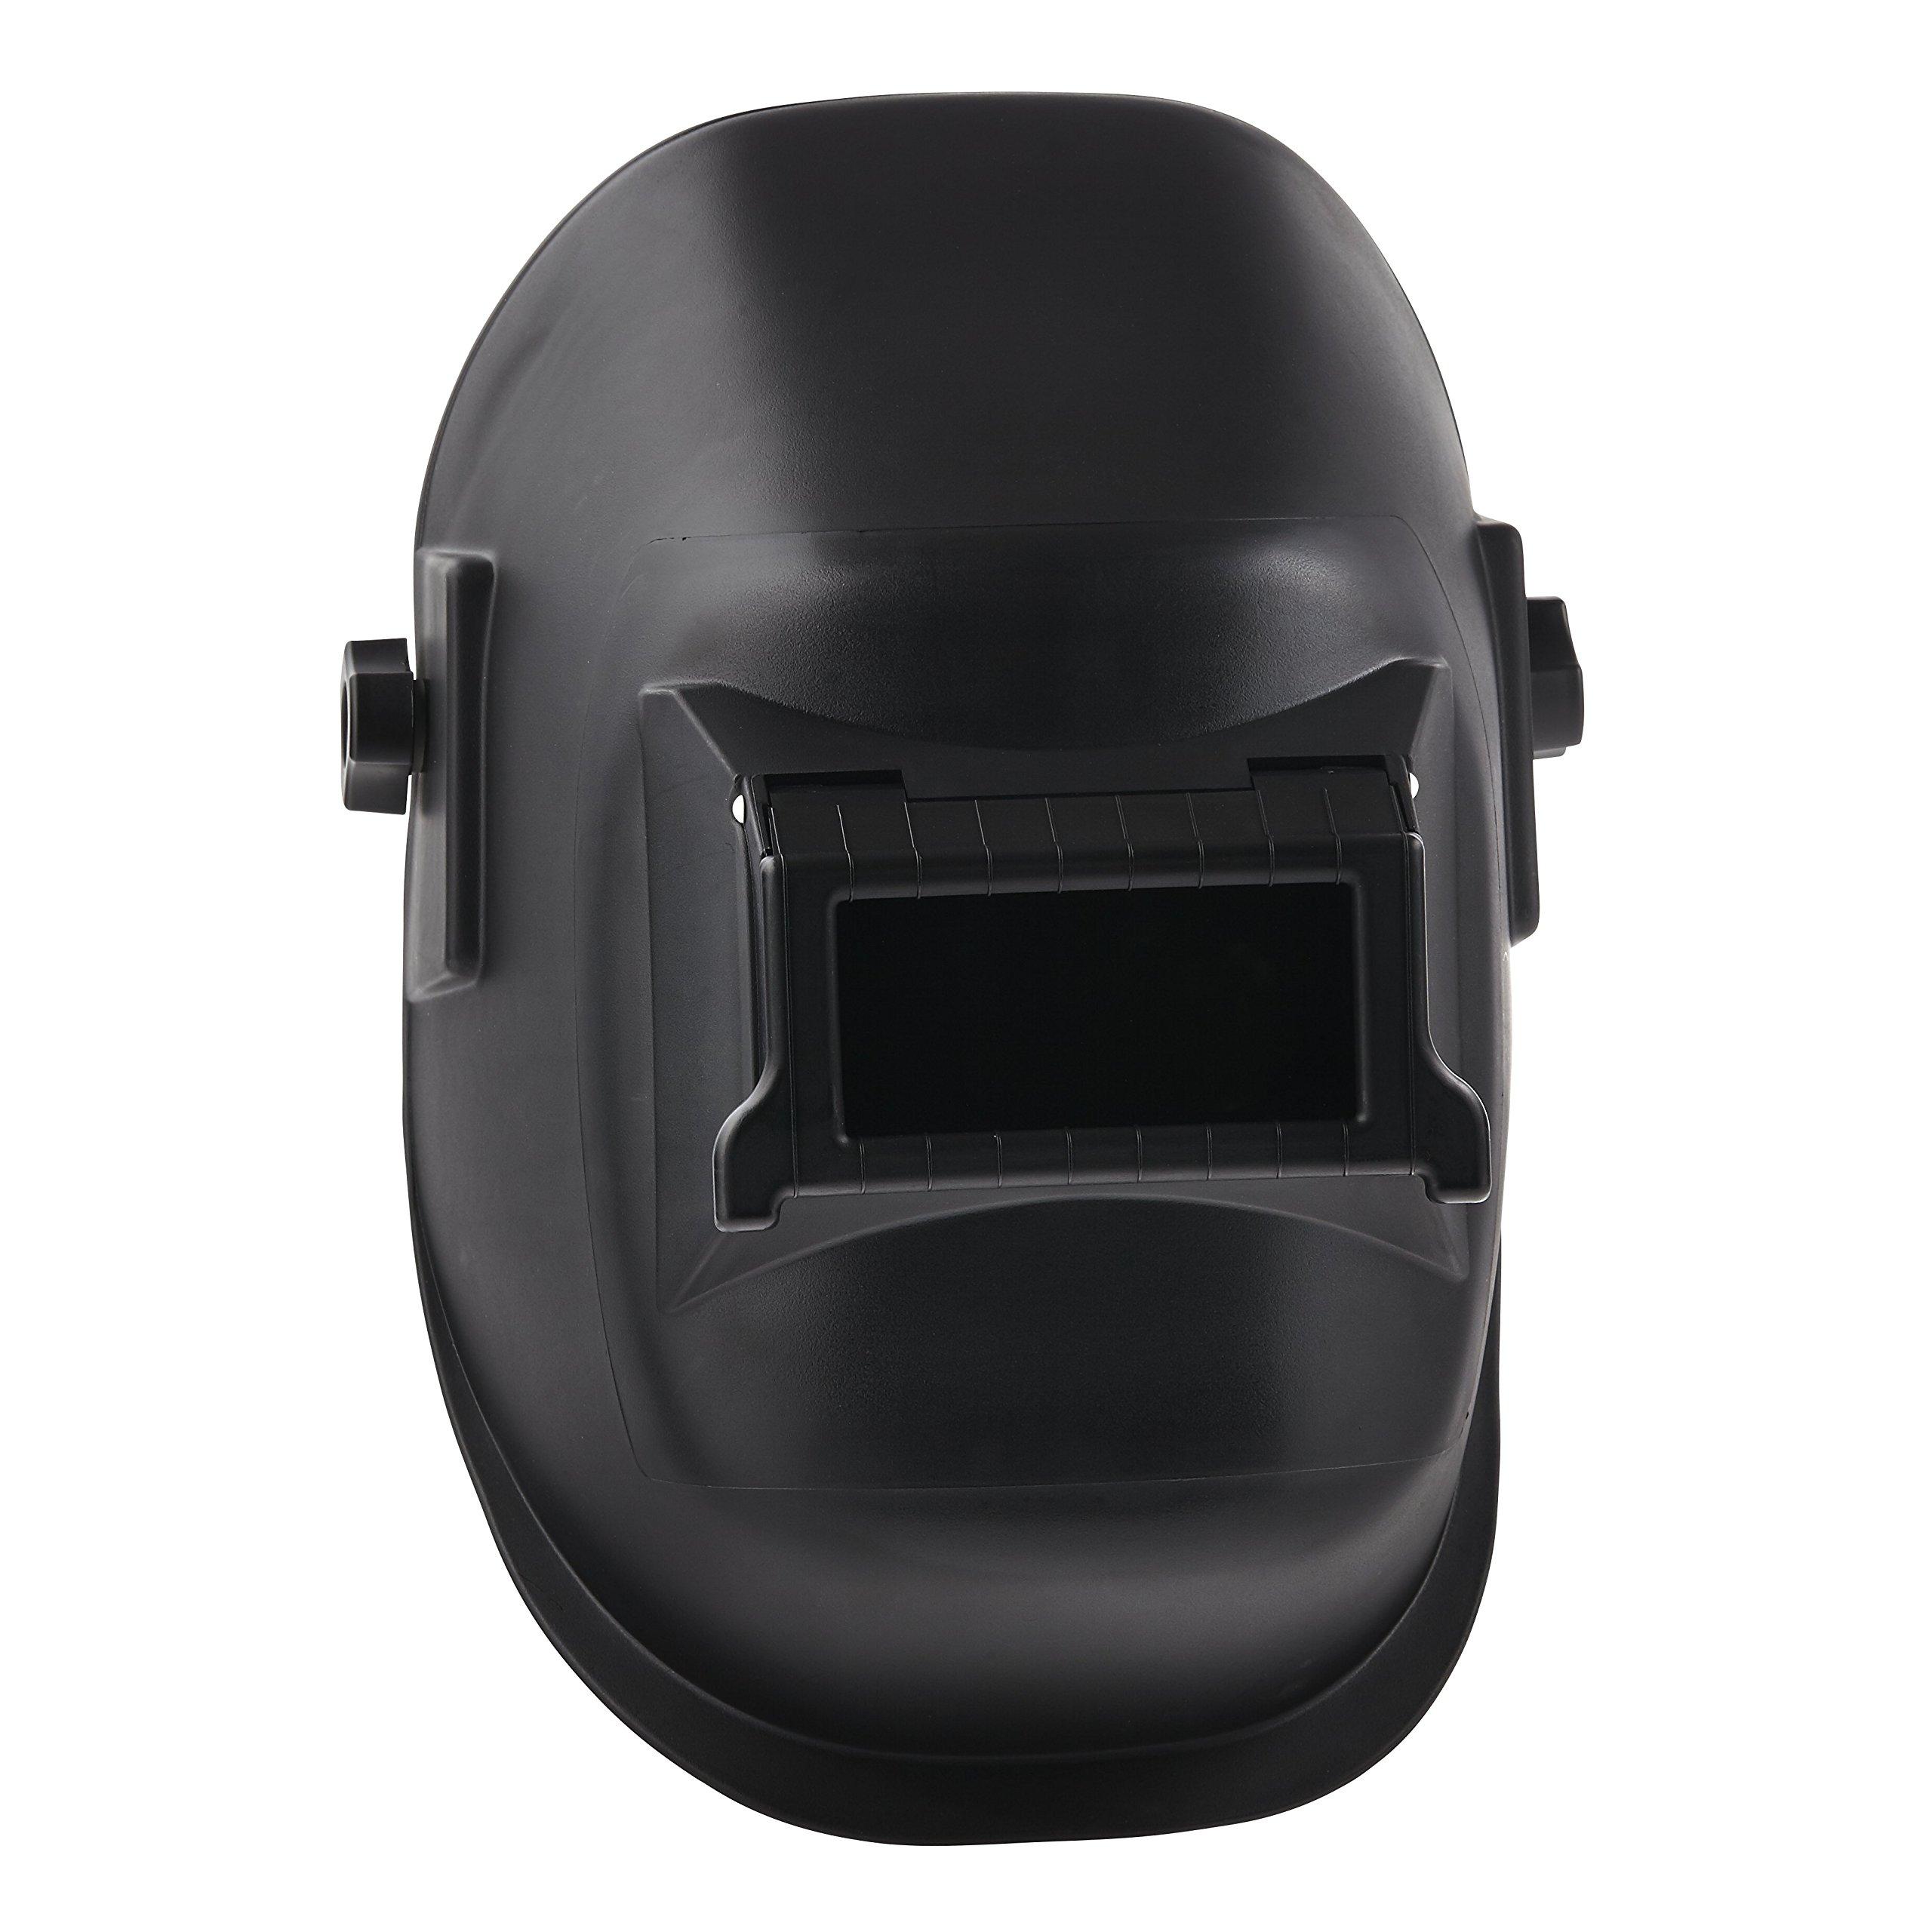 Sellstrom S29301 All-Purpose Welding Helmet 2'' x 4 1/4'' Sel-Snap Lift Front, Black Nylon w/Ratchet Headgear, Made in USA by Sellstrom